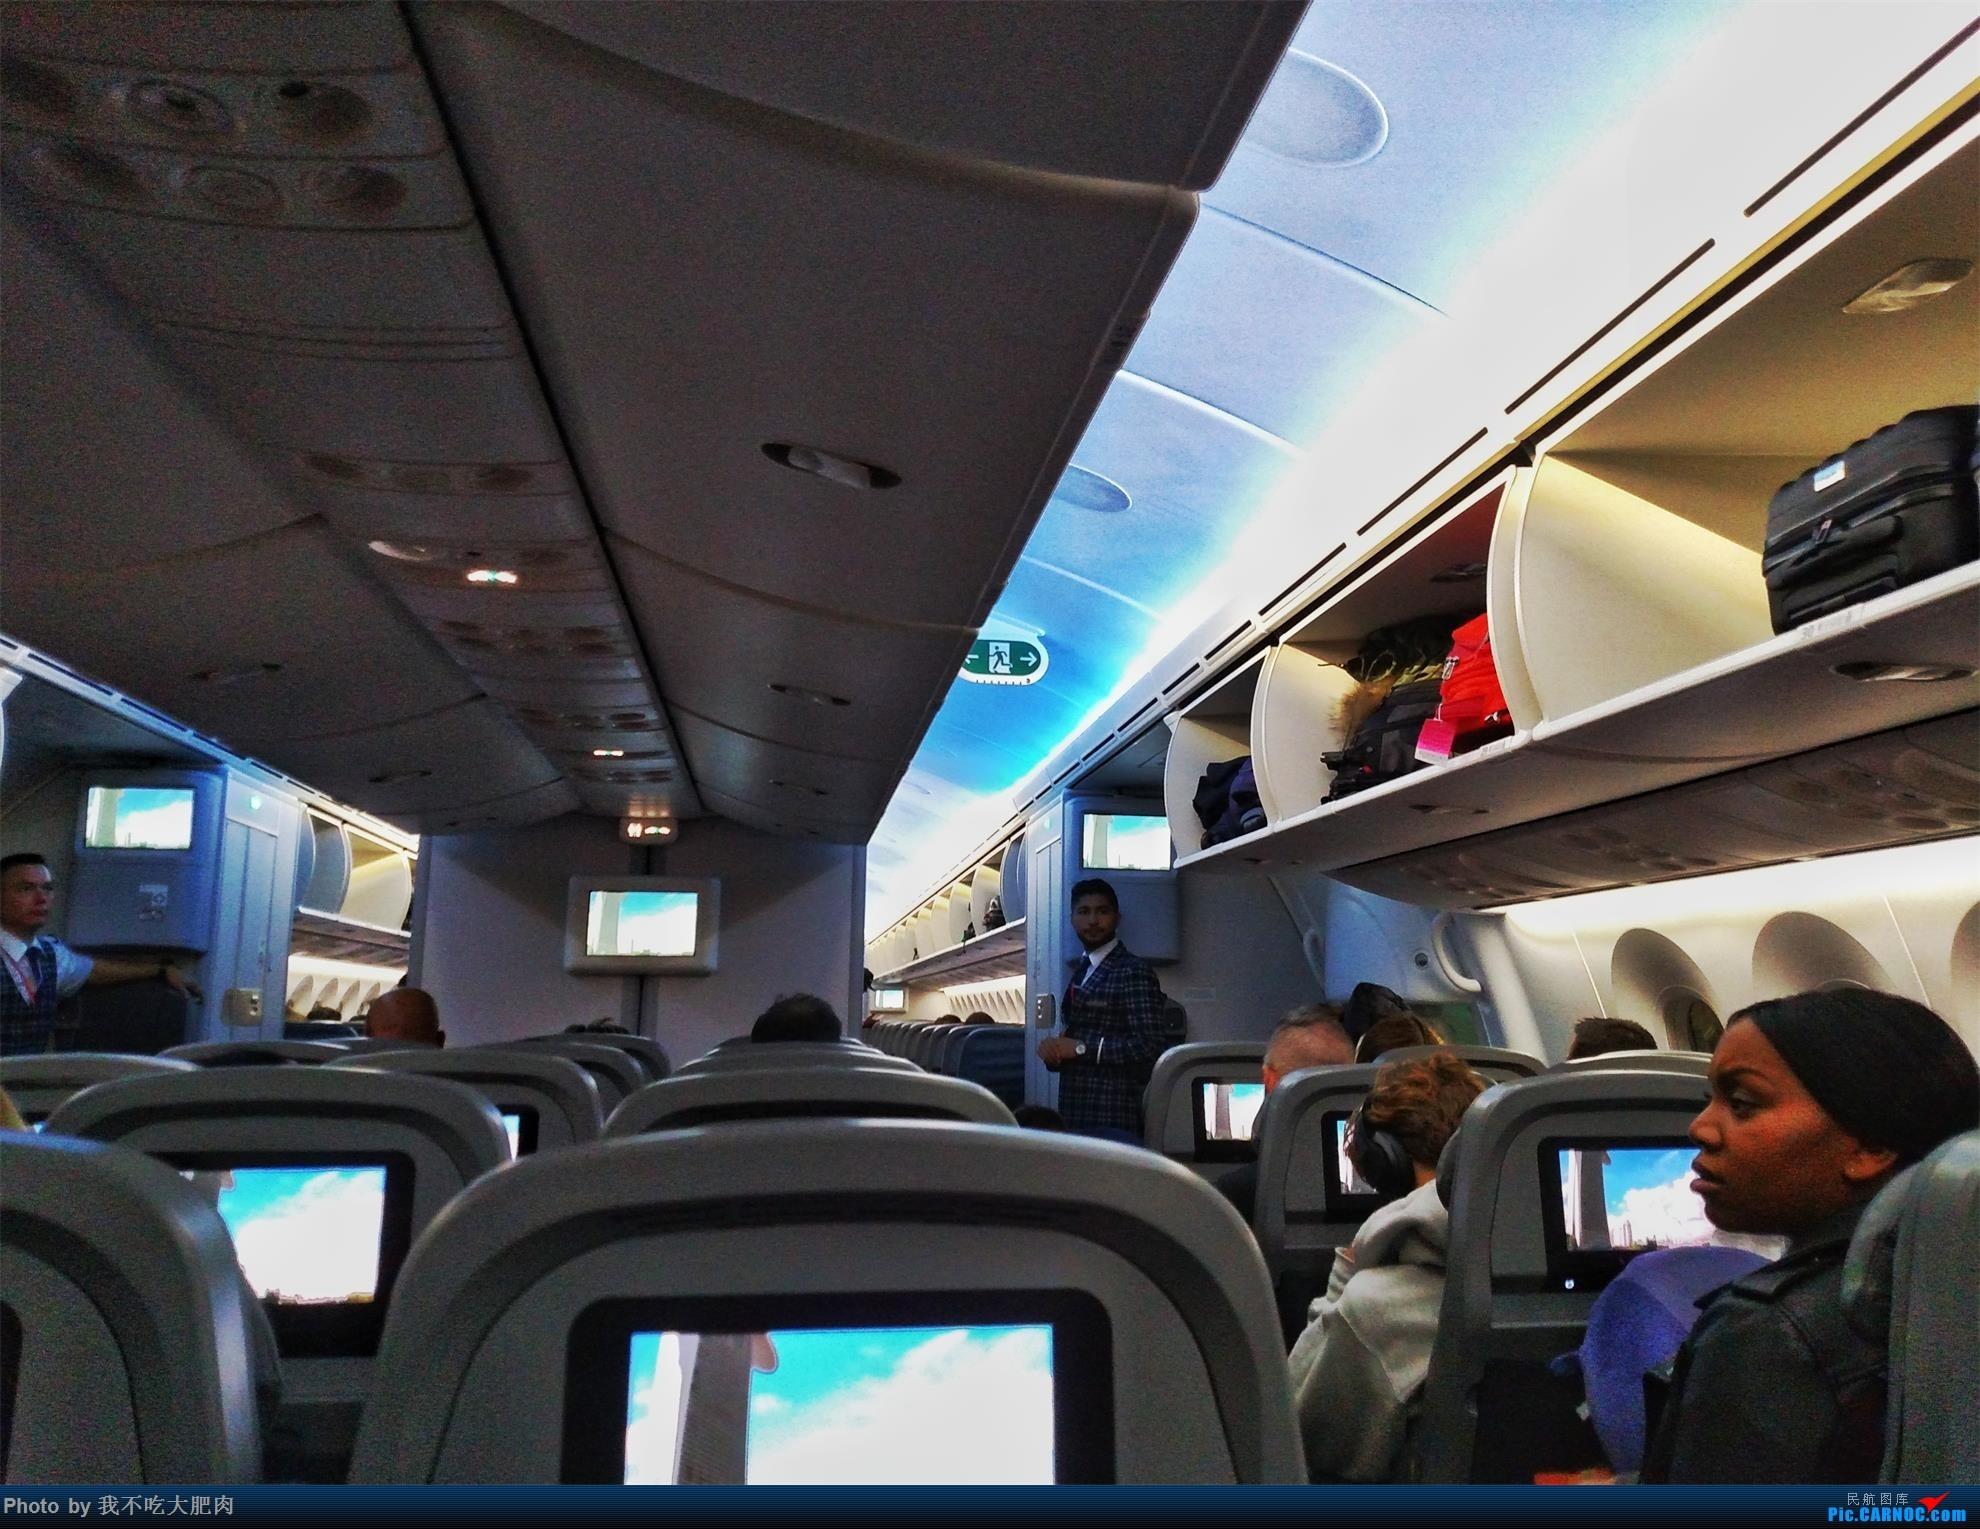 Re:[原创]挪威航空 Norwegian Airlines 纽约伦敦伪首发 BOEING 787-9 G-CKNA JFK